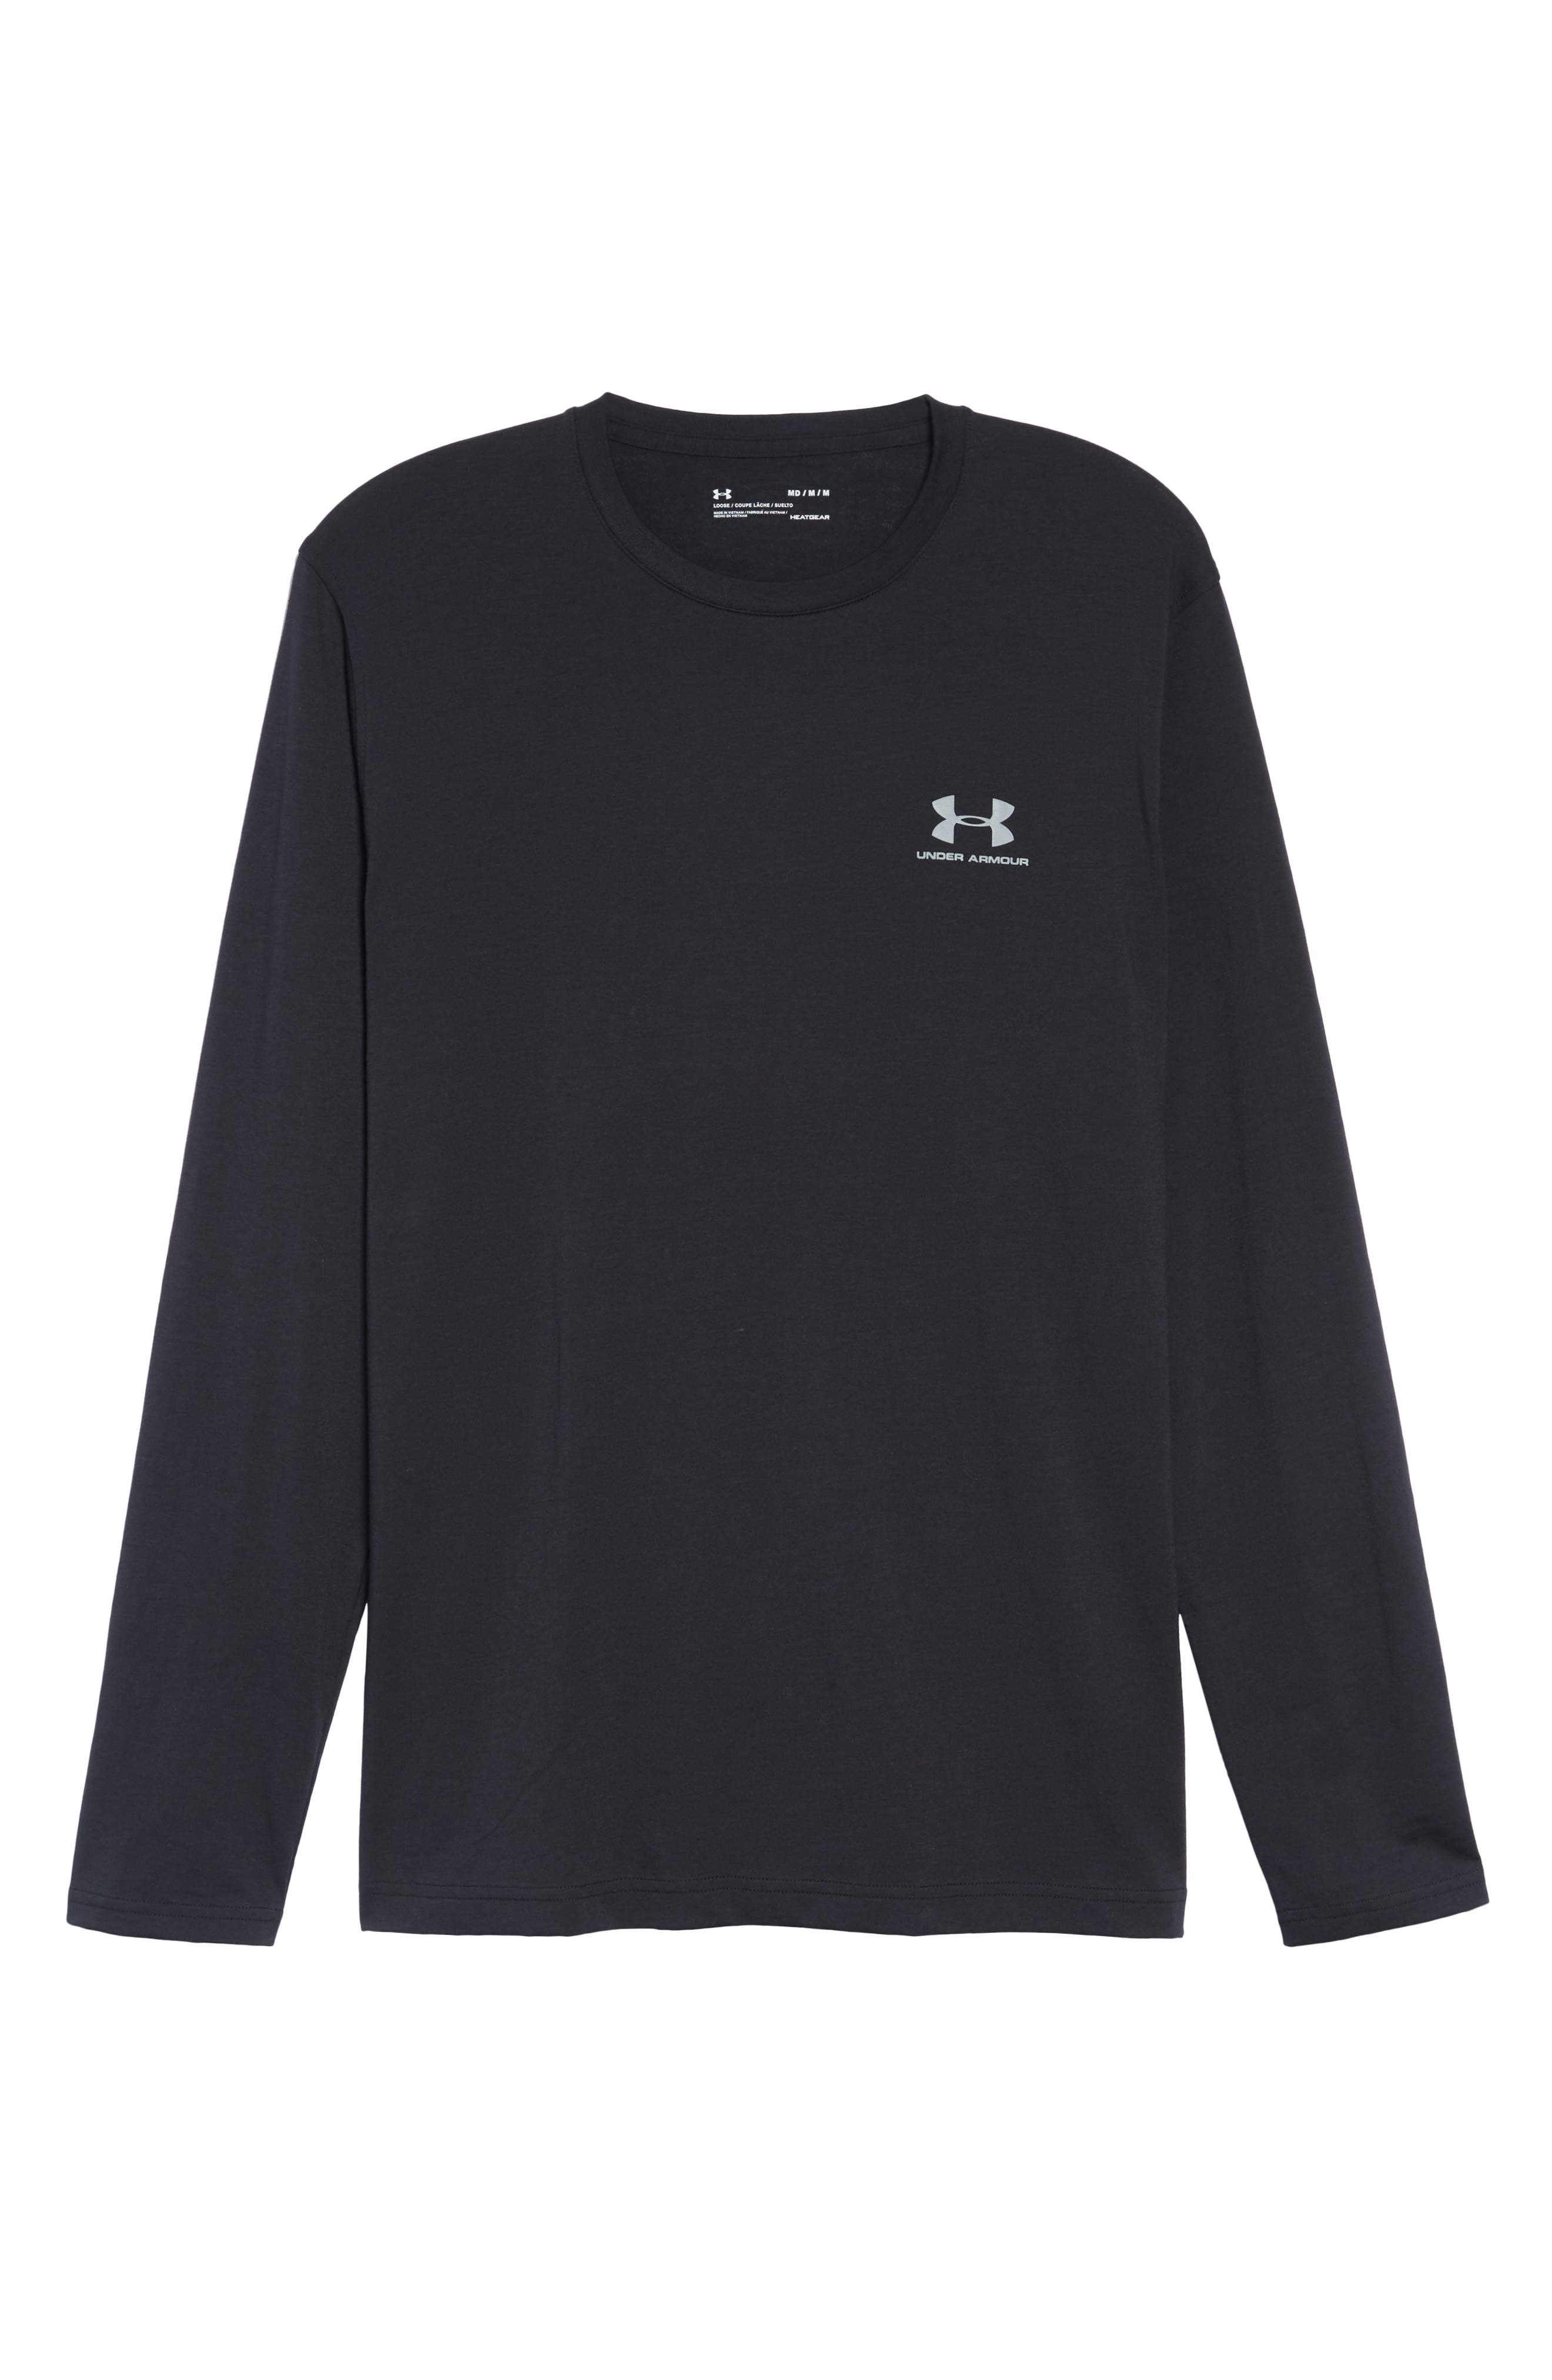 HeatGear<sup>®</sup> Long Sleeve Performance T-Shirt,                             Alternate thumbnail 6, color,                             BLACK/ STEEL